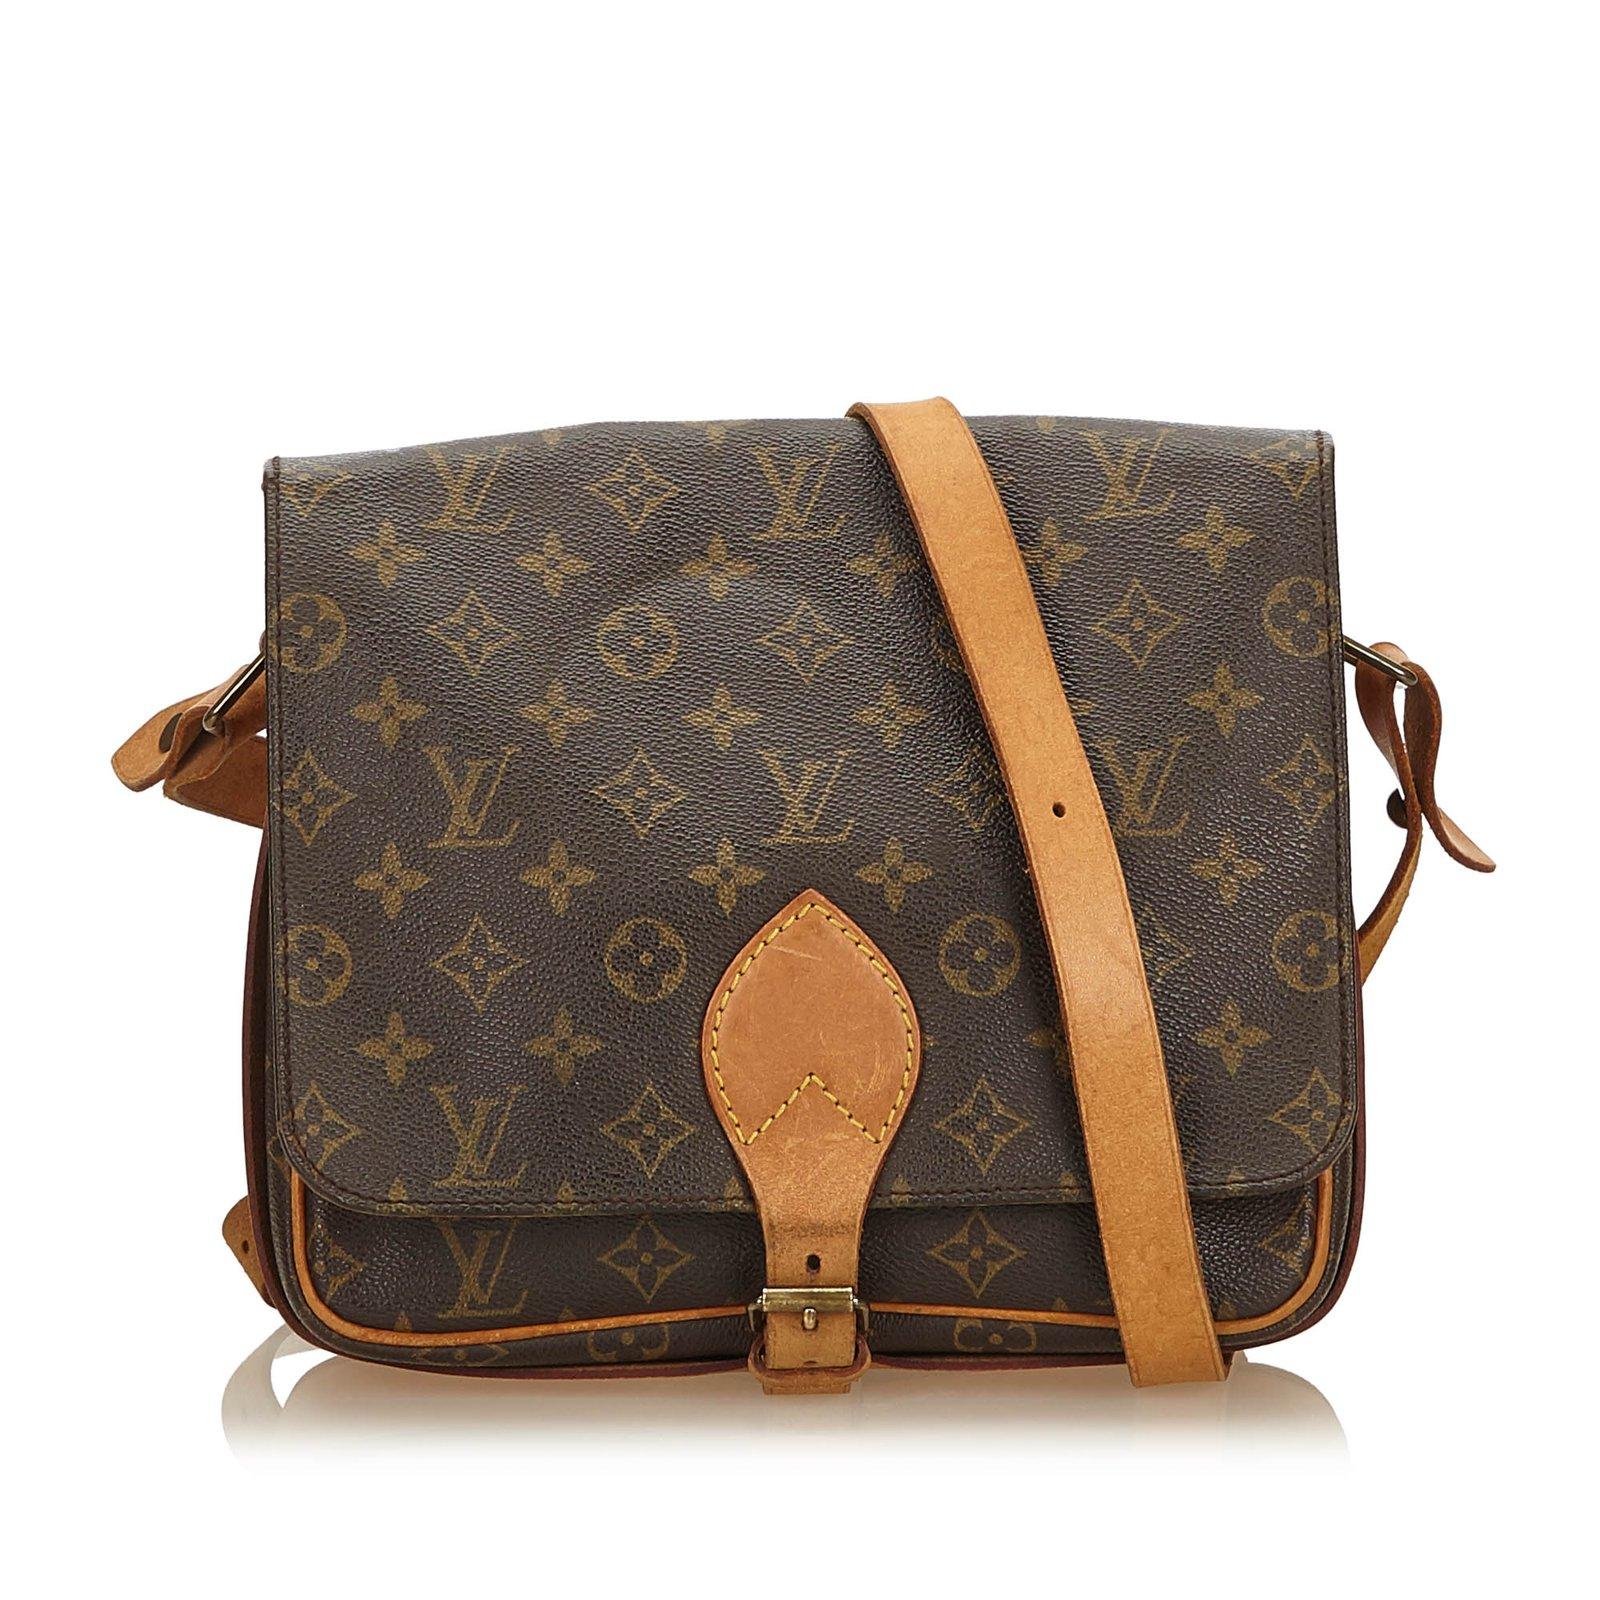 7fe2e2318636 Sacs à main Louis Vuitton Monogram Cartouchiere MM Cuir